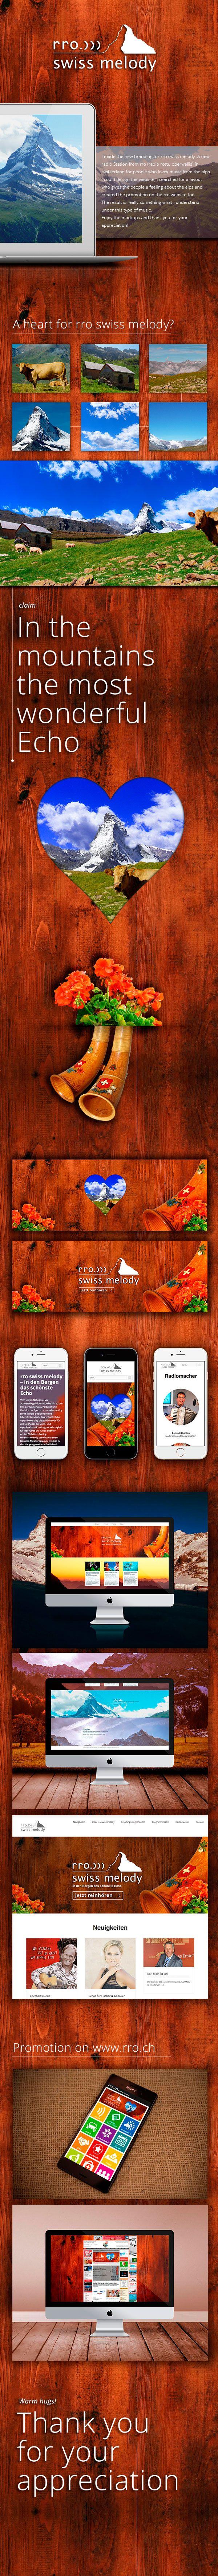 The new branding for rro swiss melody #rro #swissmelody #matterhorn #zermatt